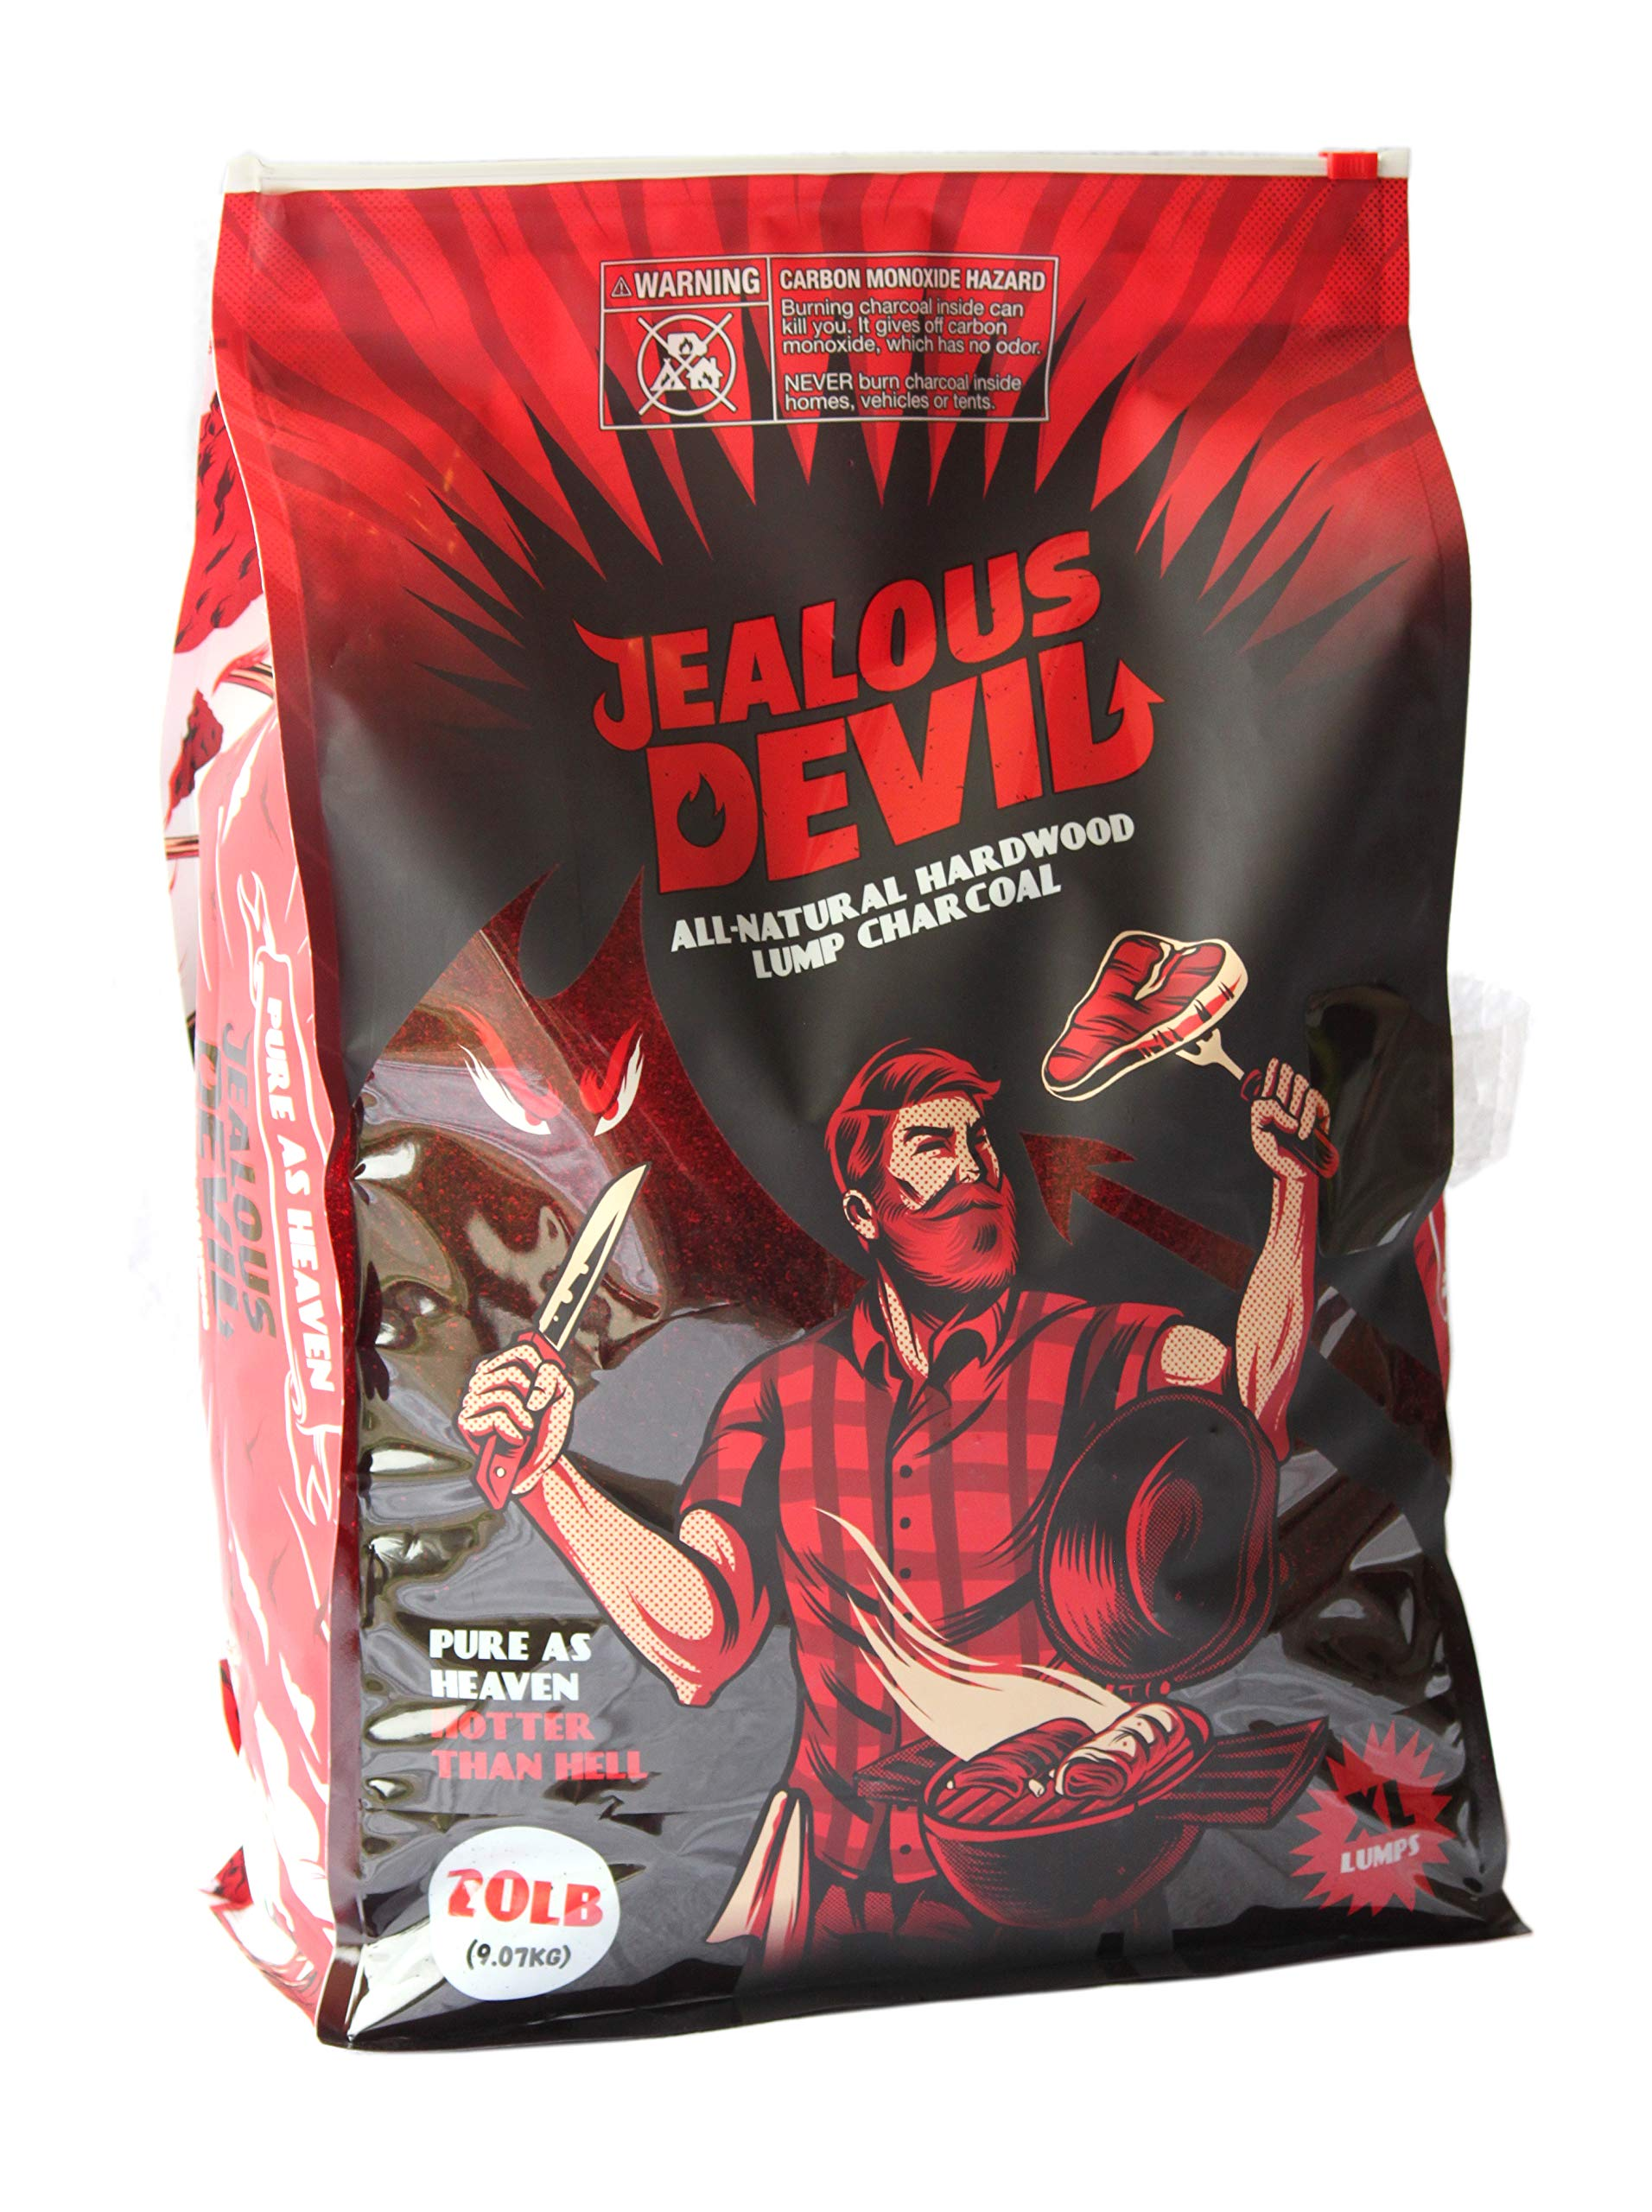 Jealous Devil All Natural Hardwood Lump Charcoal - 20LB